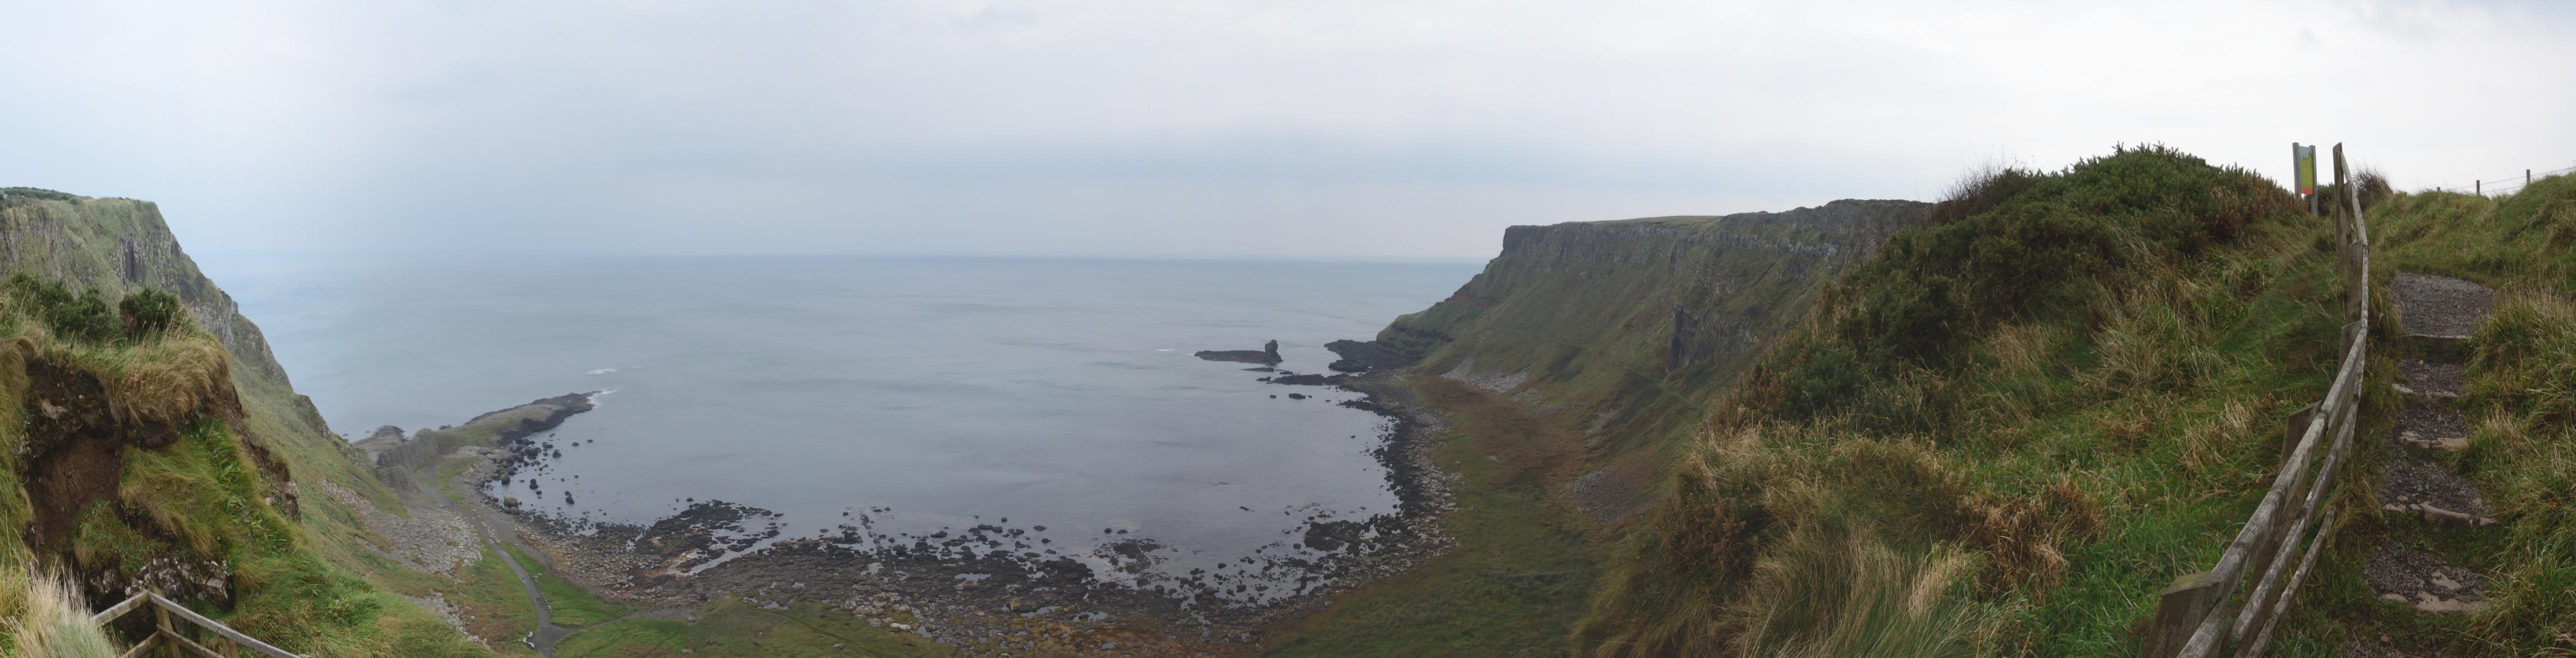 Sheperd's Steps Giant's Causeway